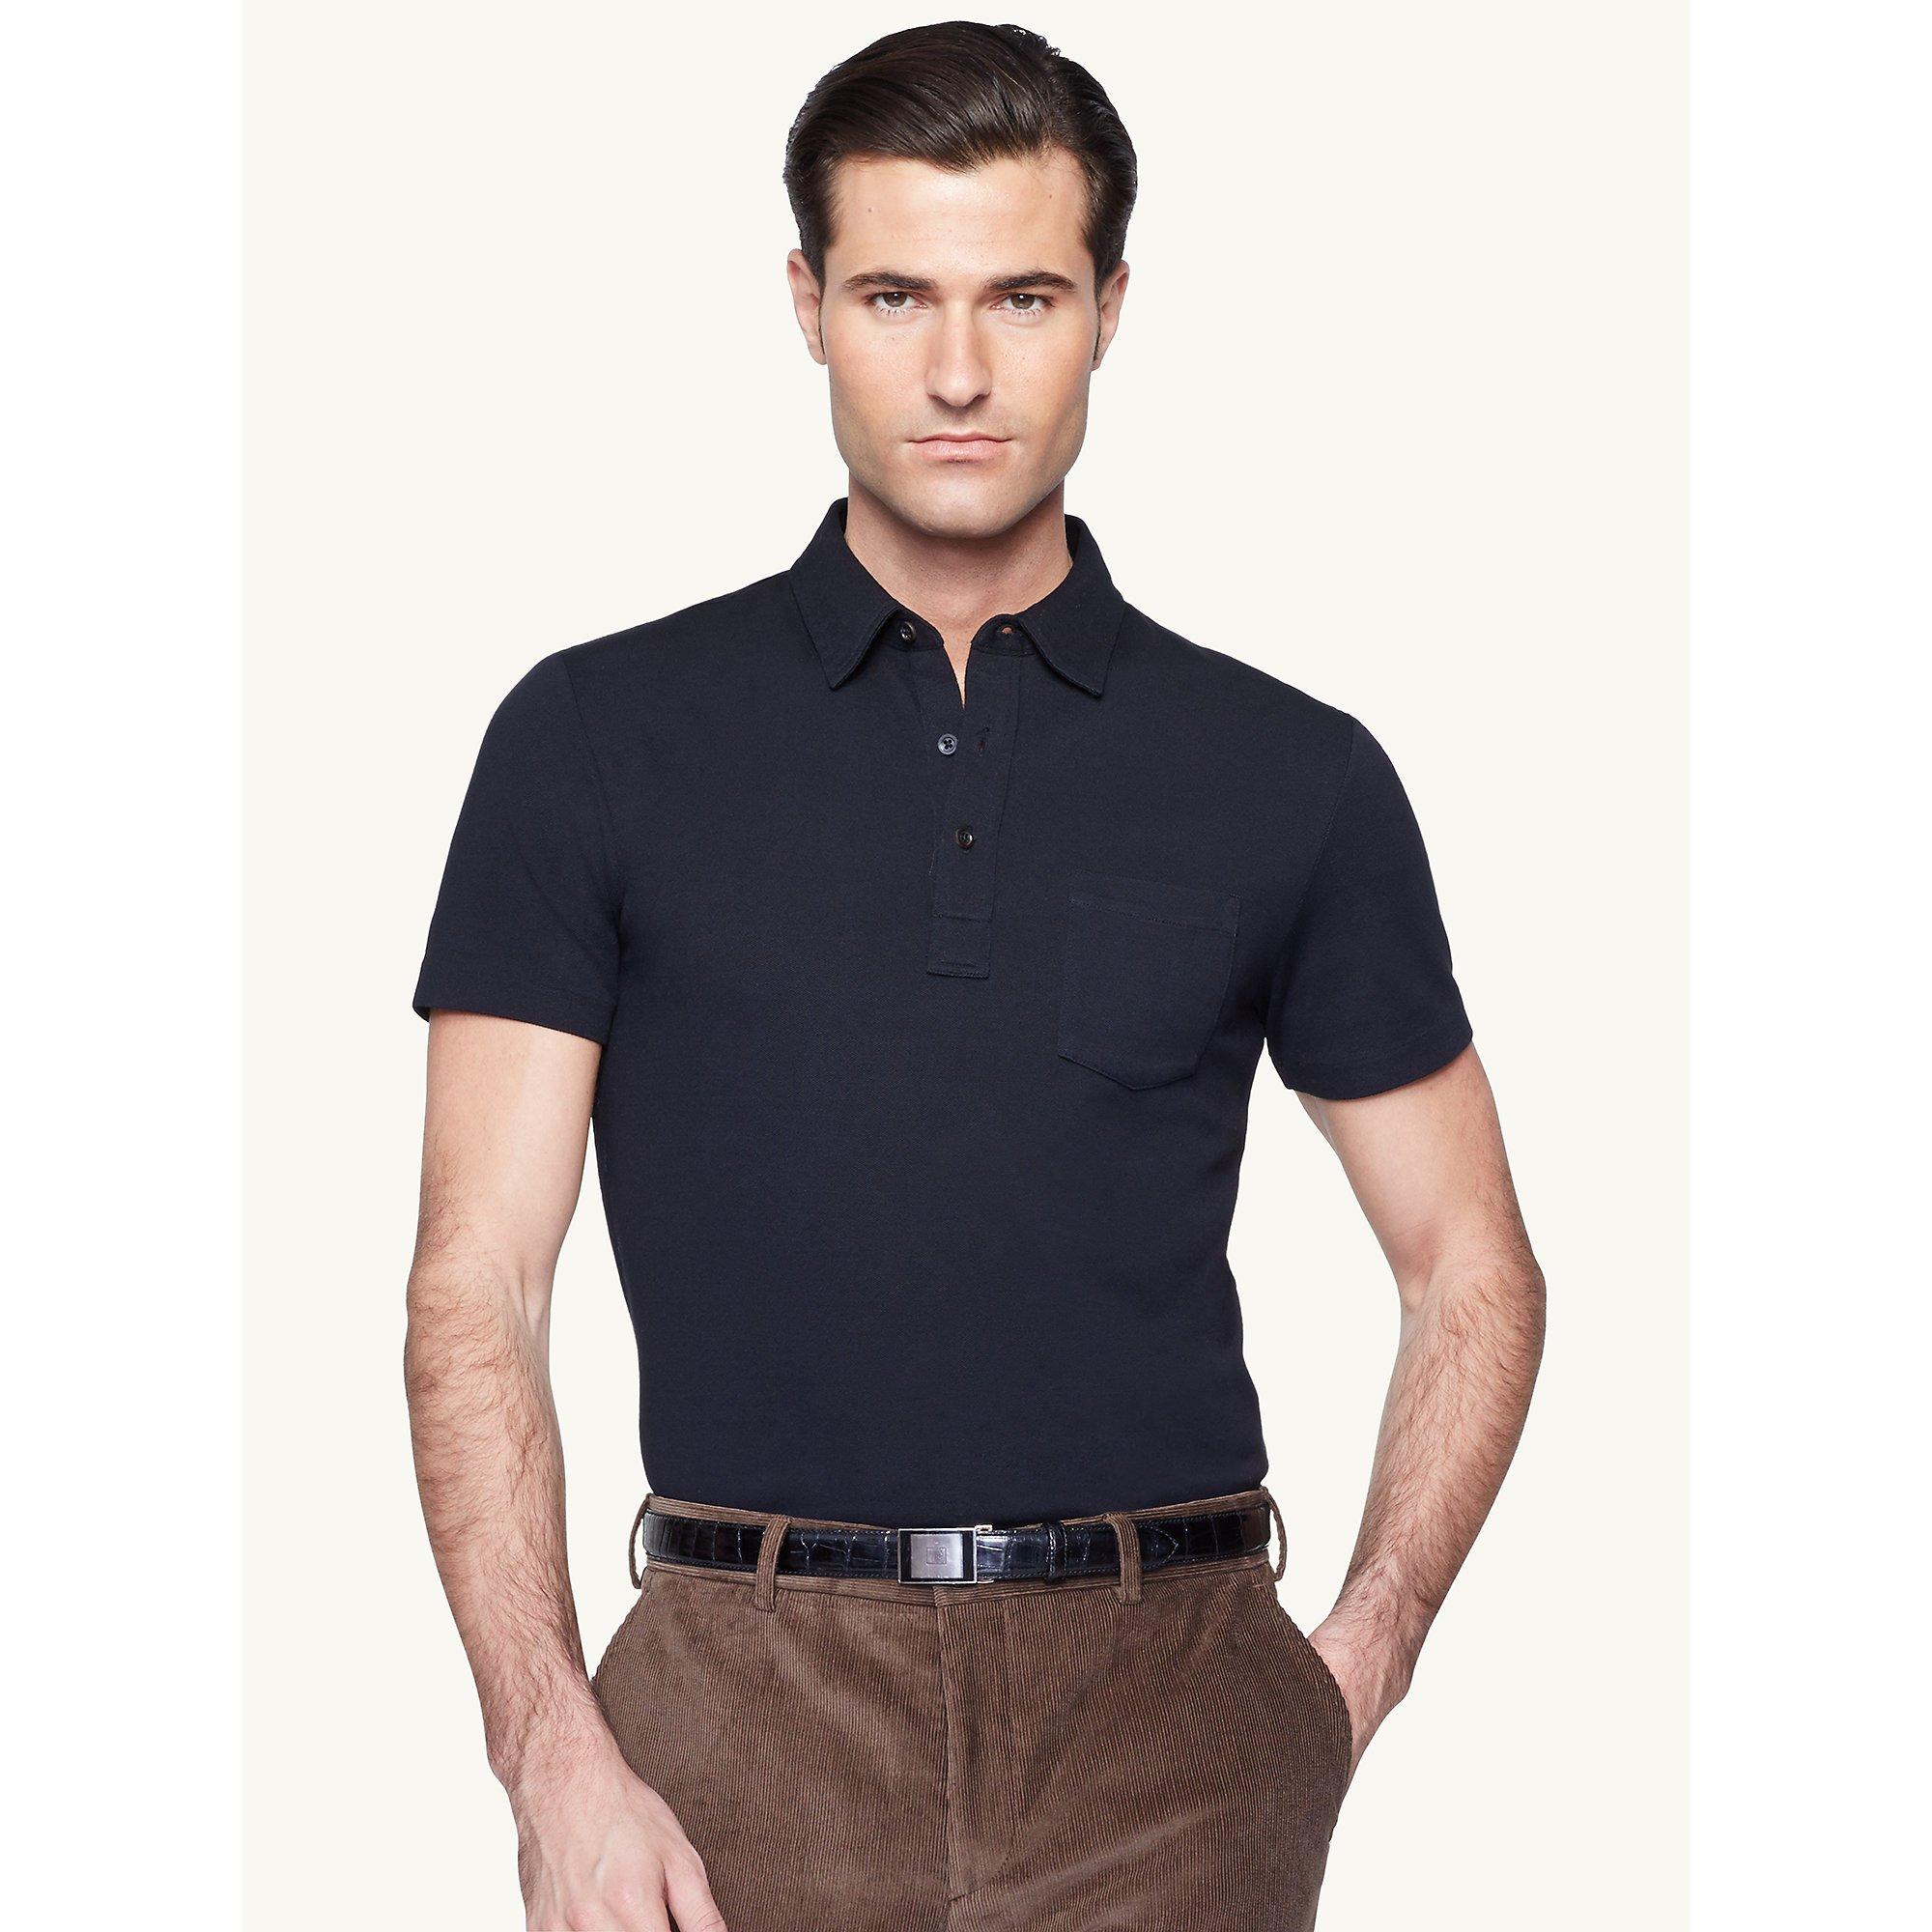 Ralph lauren black label short sleeved pocket t shirt in for Ralph lauren black label polo shirt